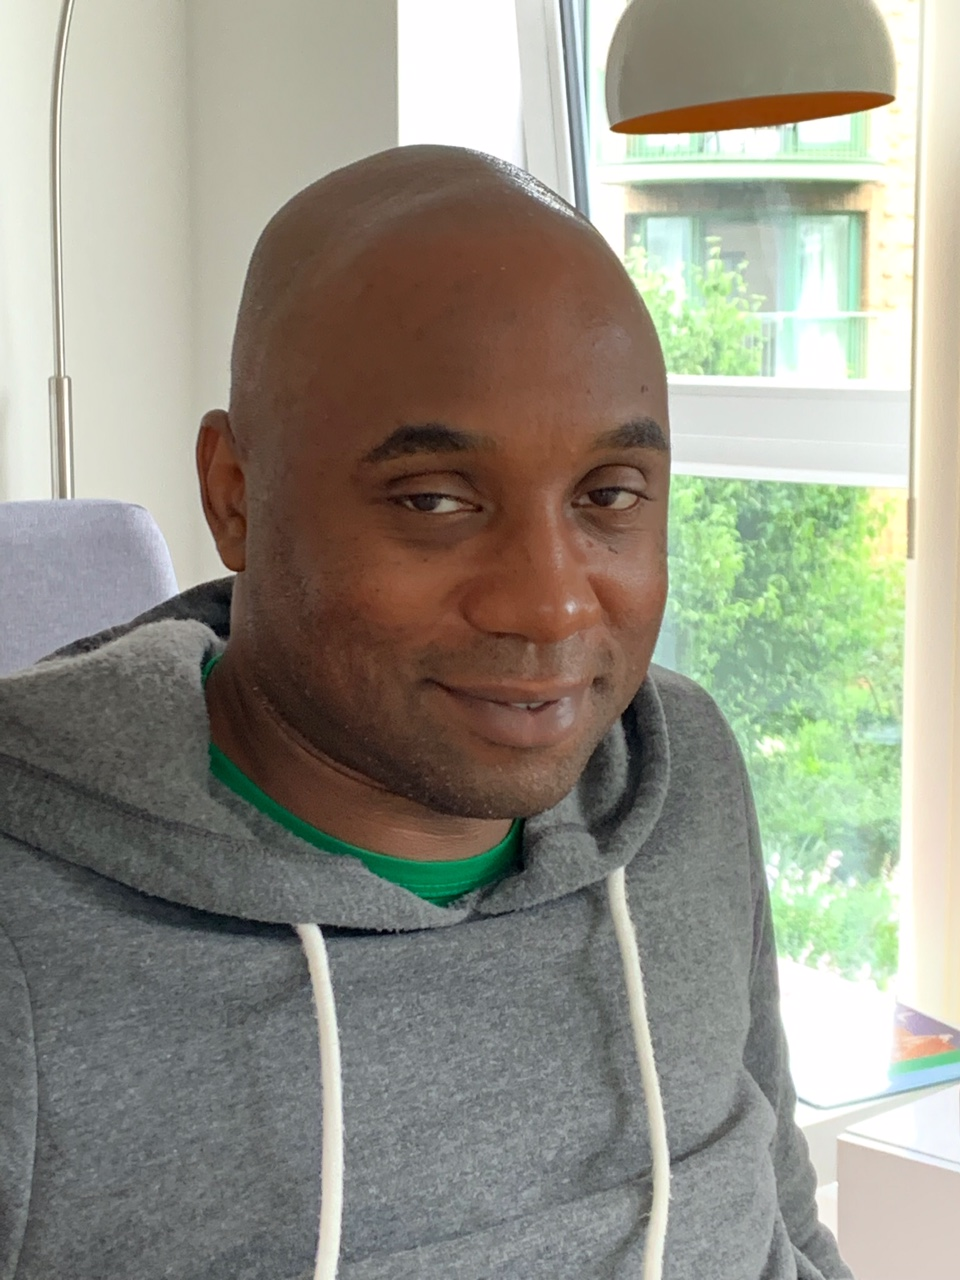 Martin Dyce, Social Media and Marketing Officer at Regain Sports Charity